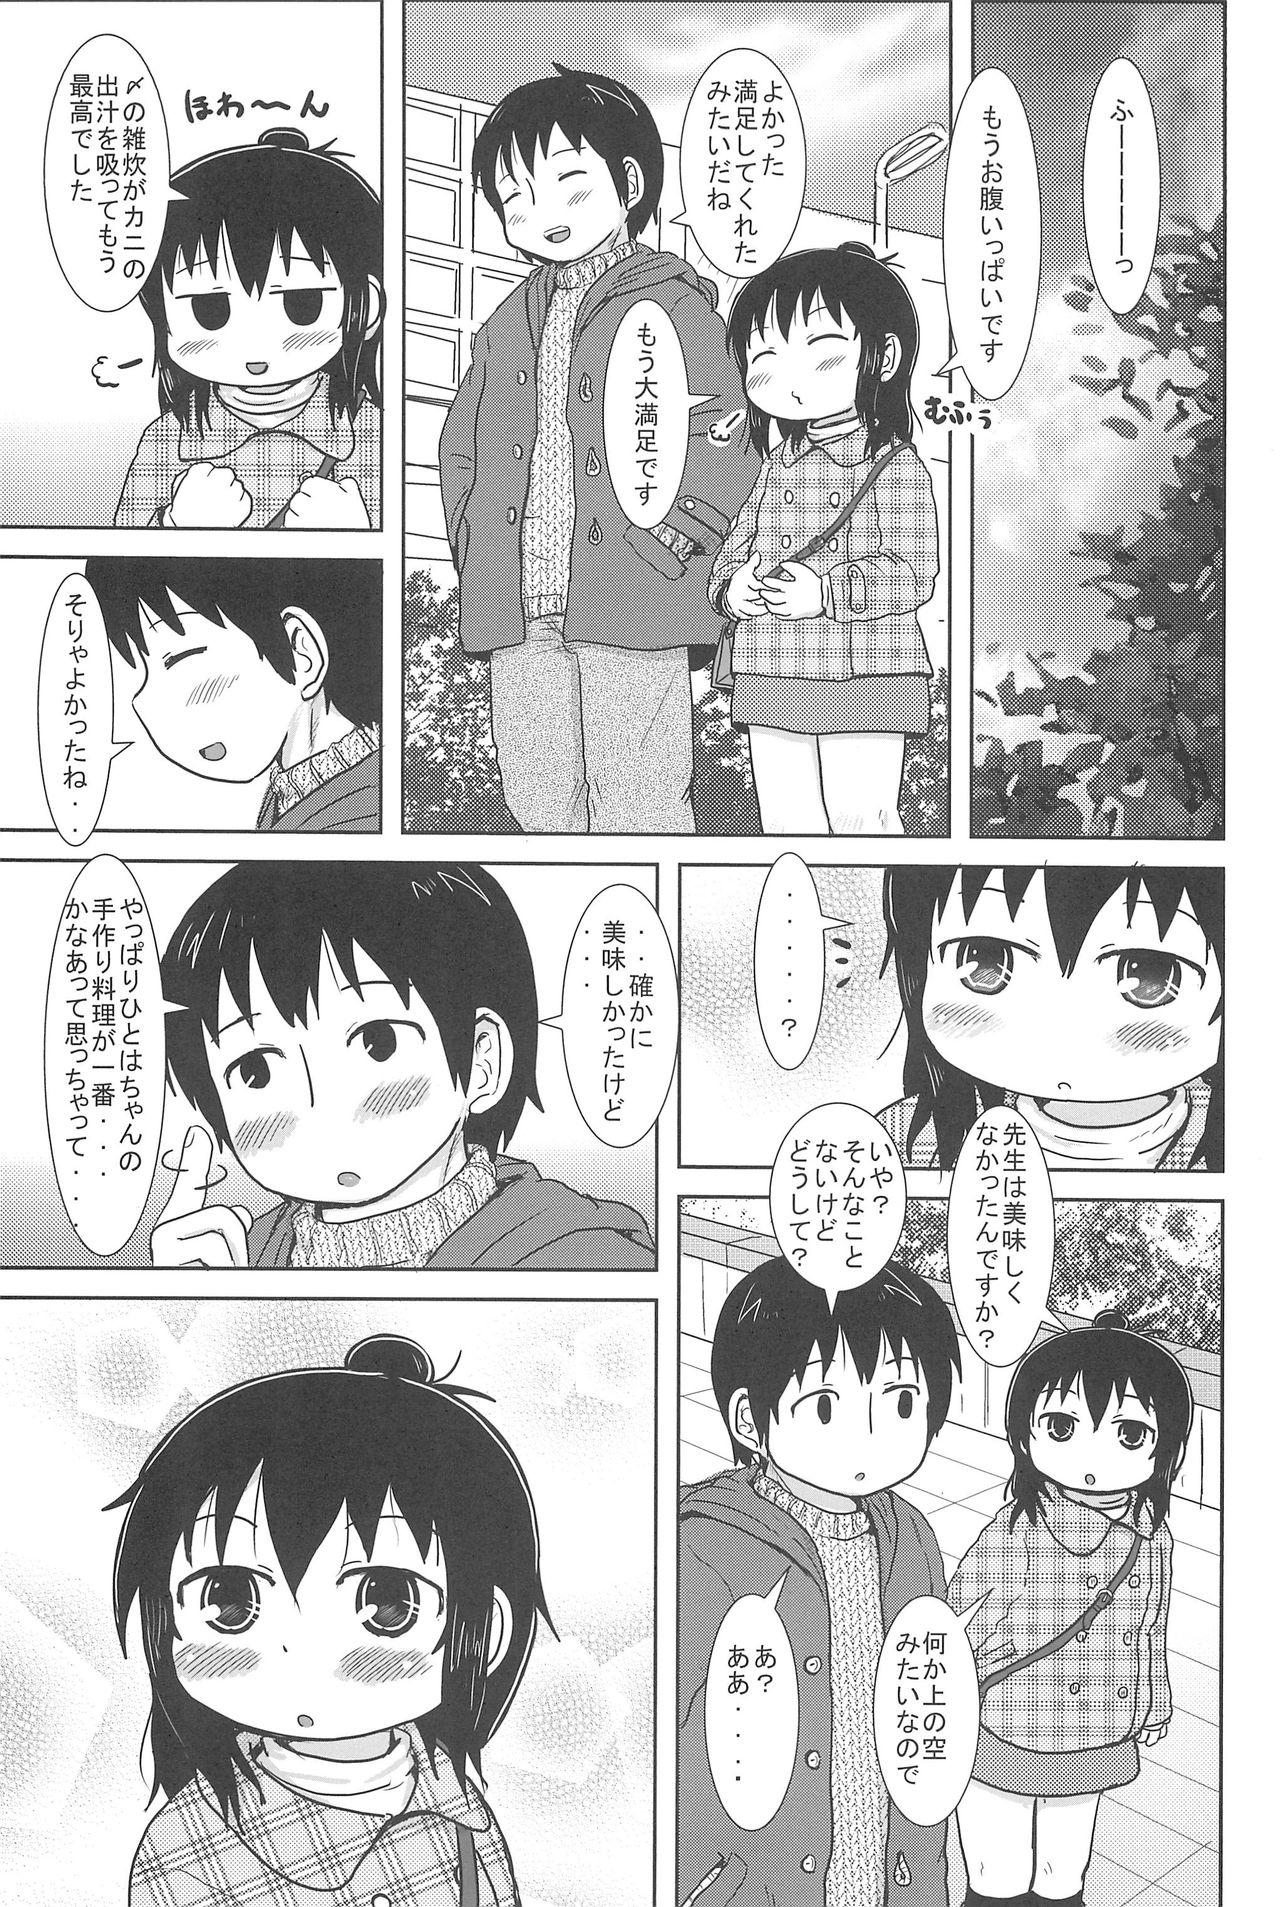 Futari de Oishiku 6